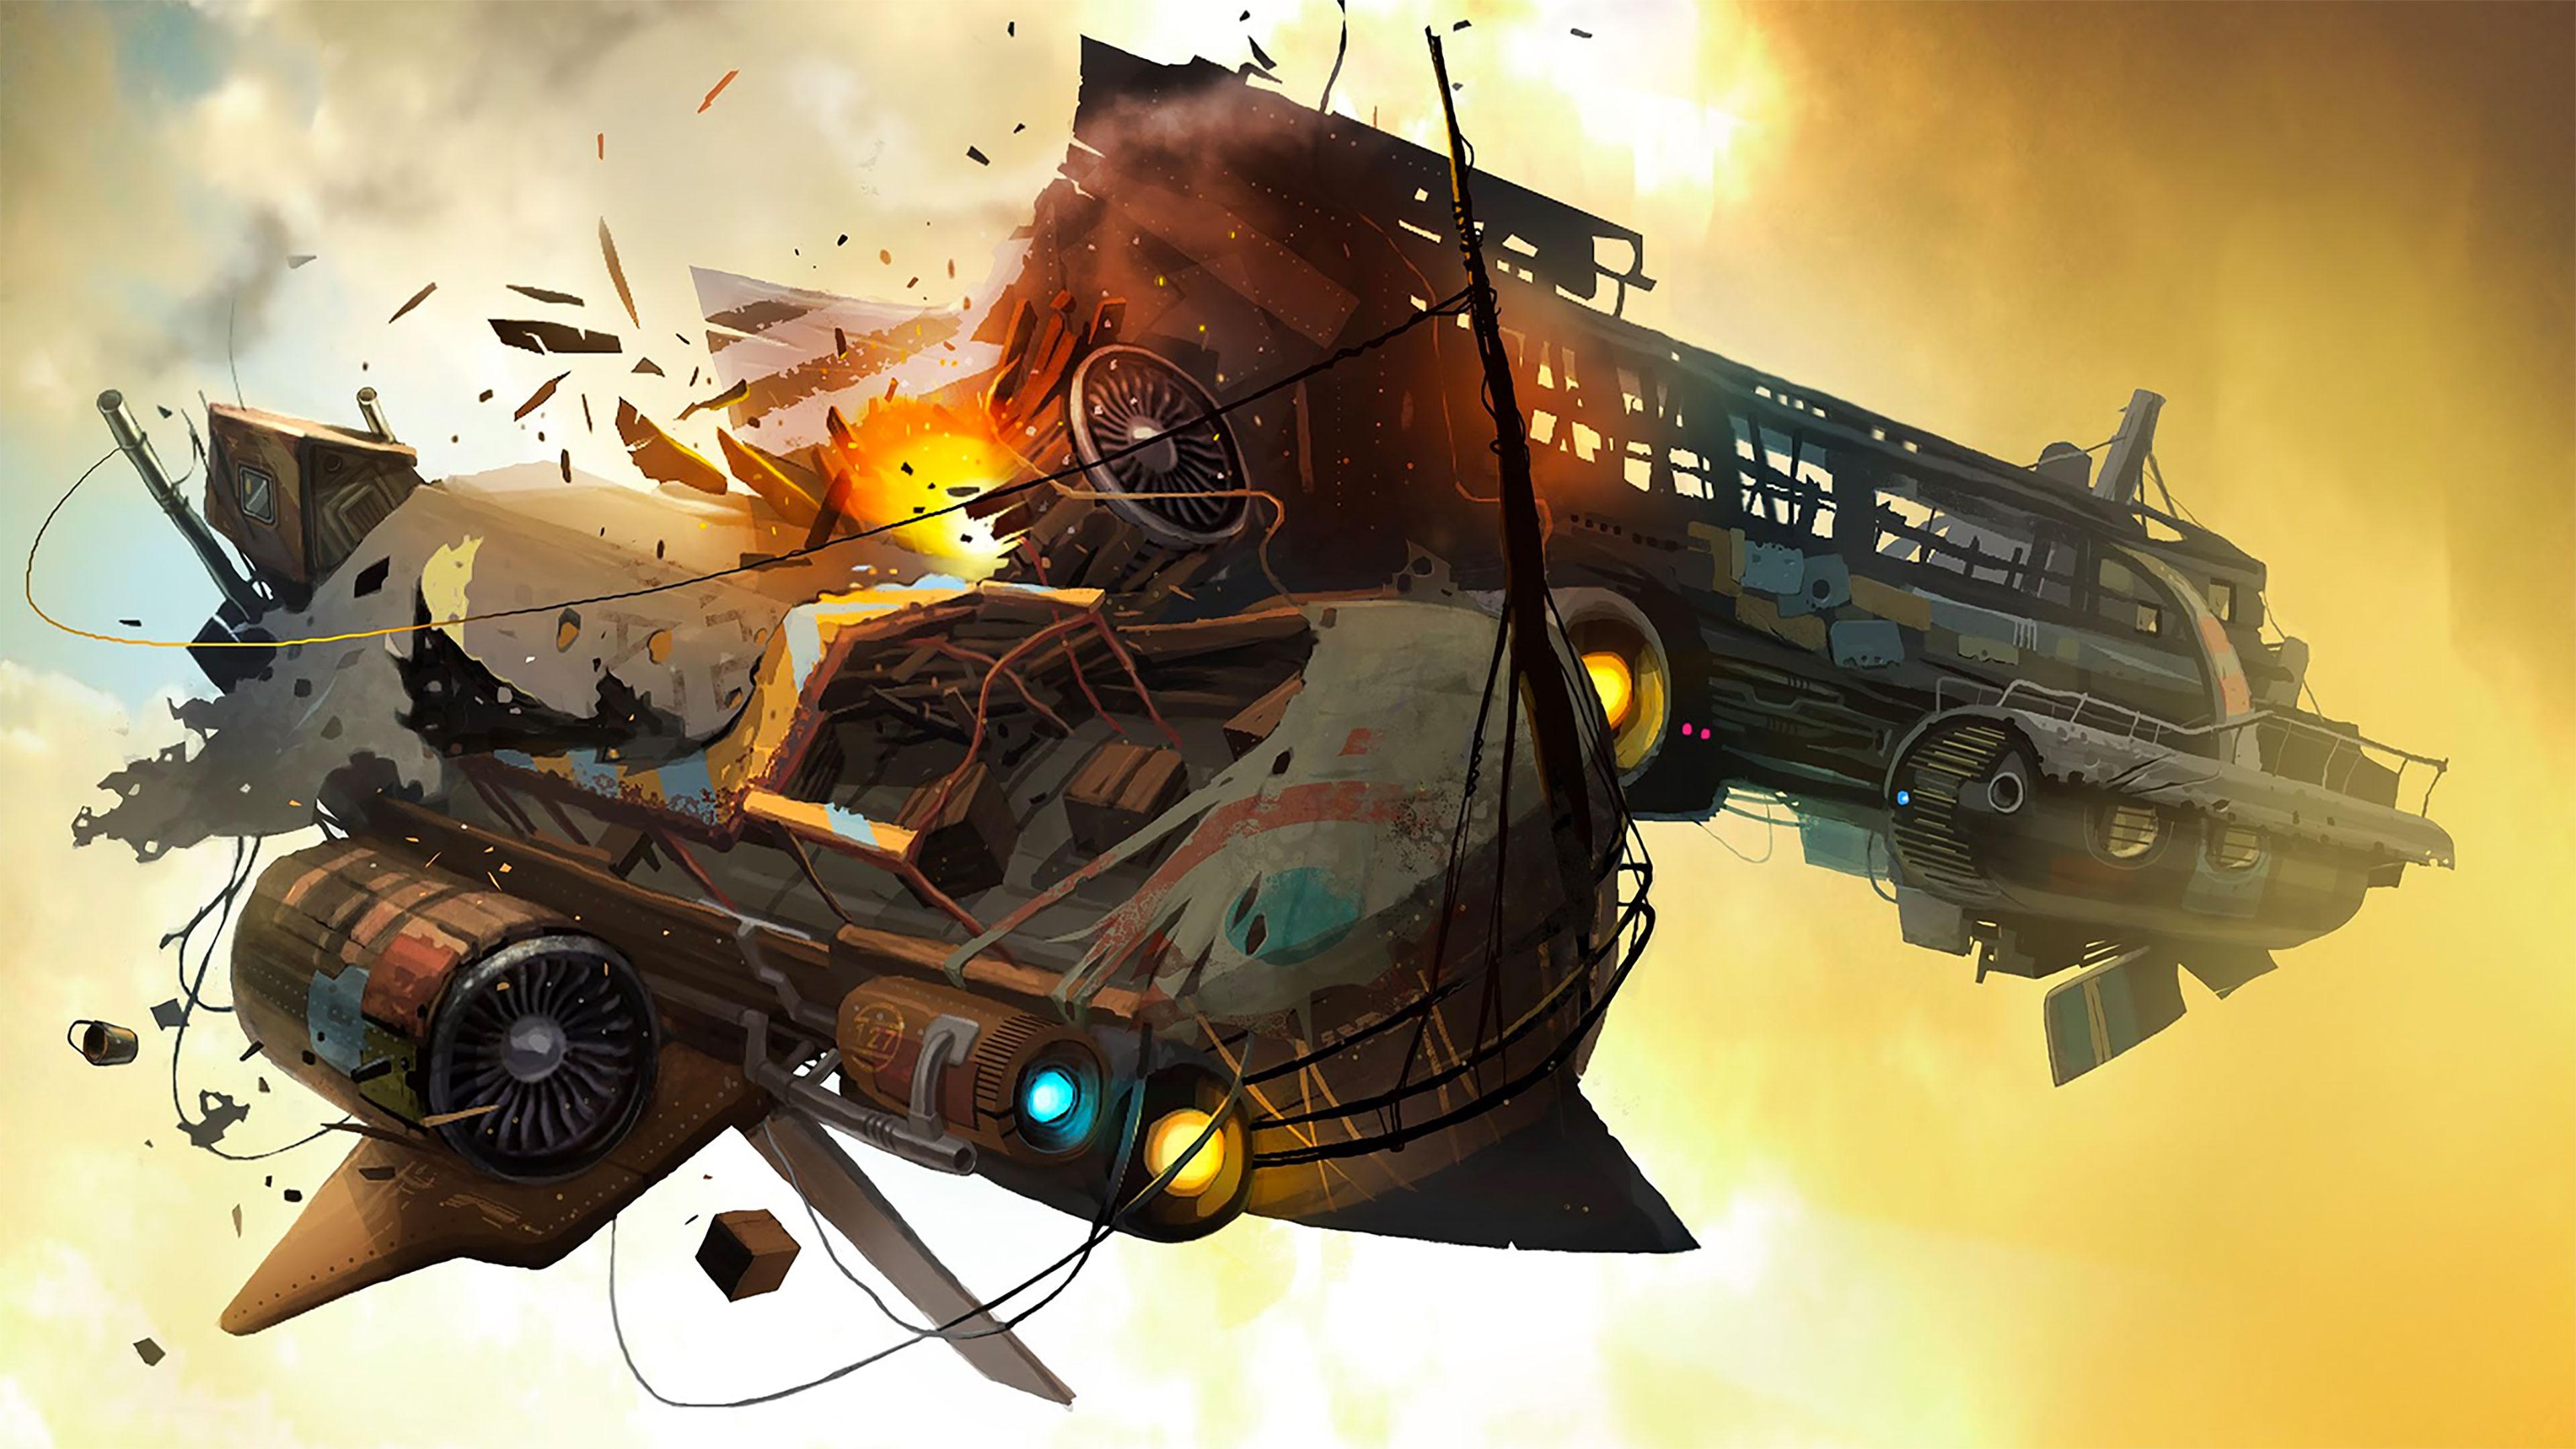 Best Car Wallpapers Batman Worlds Adrift Wallpapers In Ultra Hd 4k Gameranx